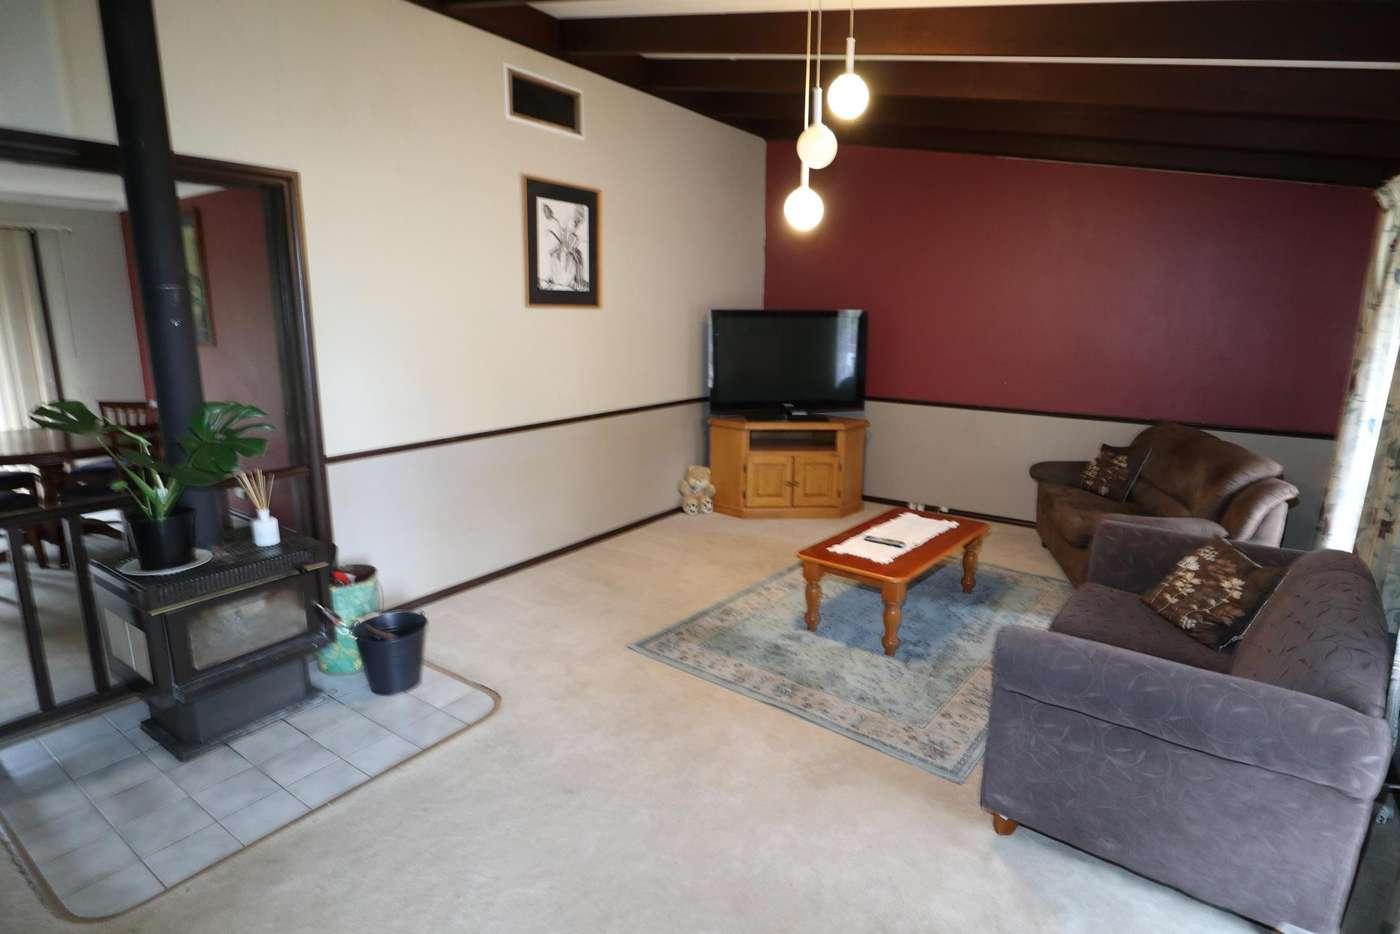 Main view of Homely house listing, 7 Dellar Street, Narrogin WA 6312